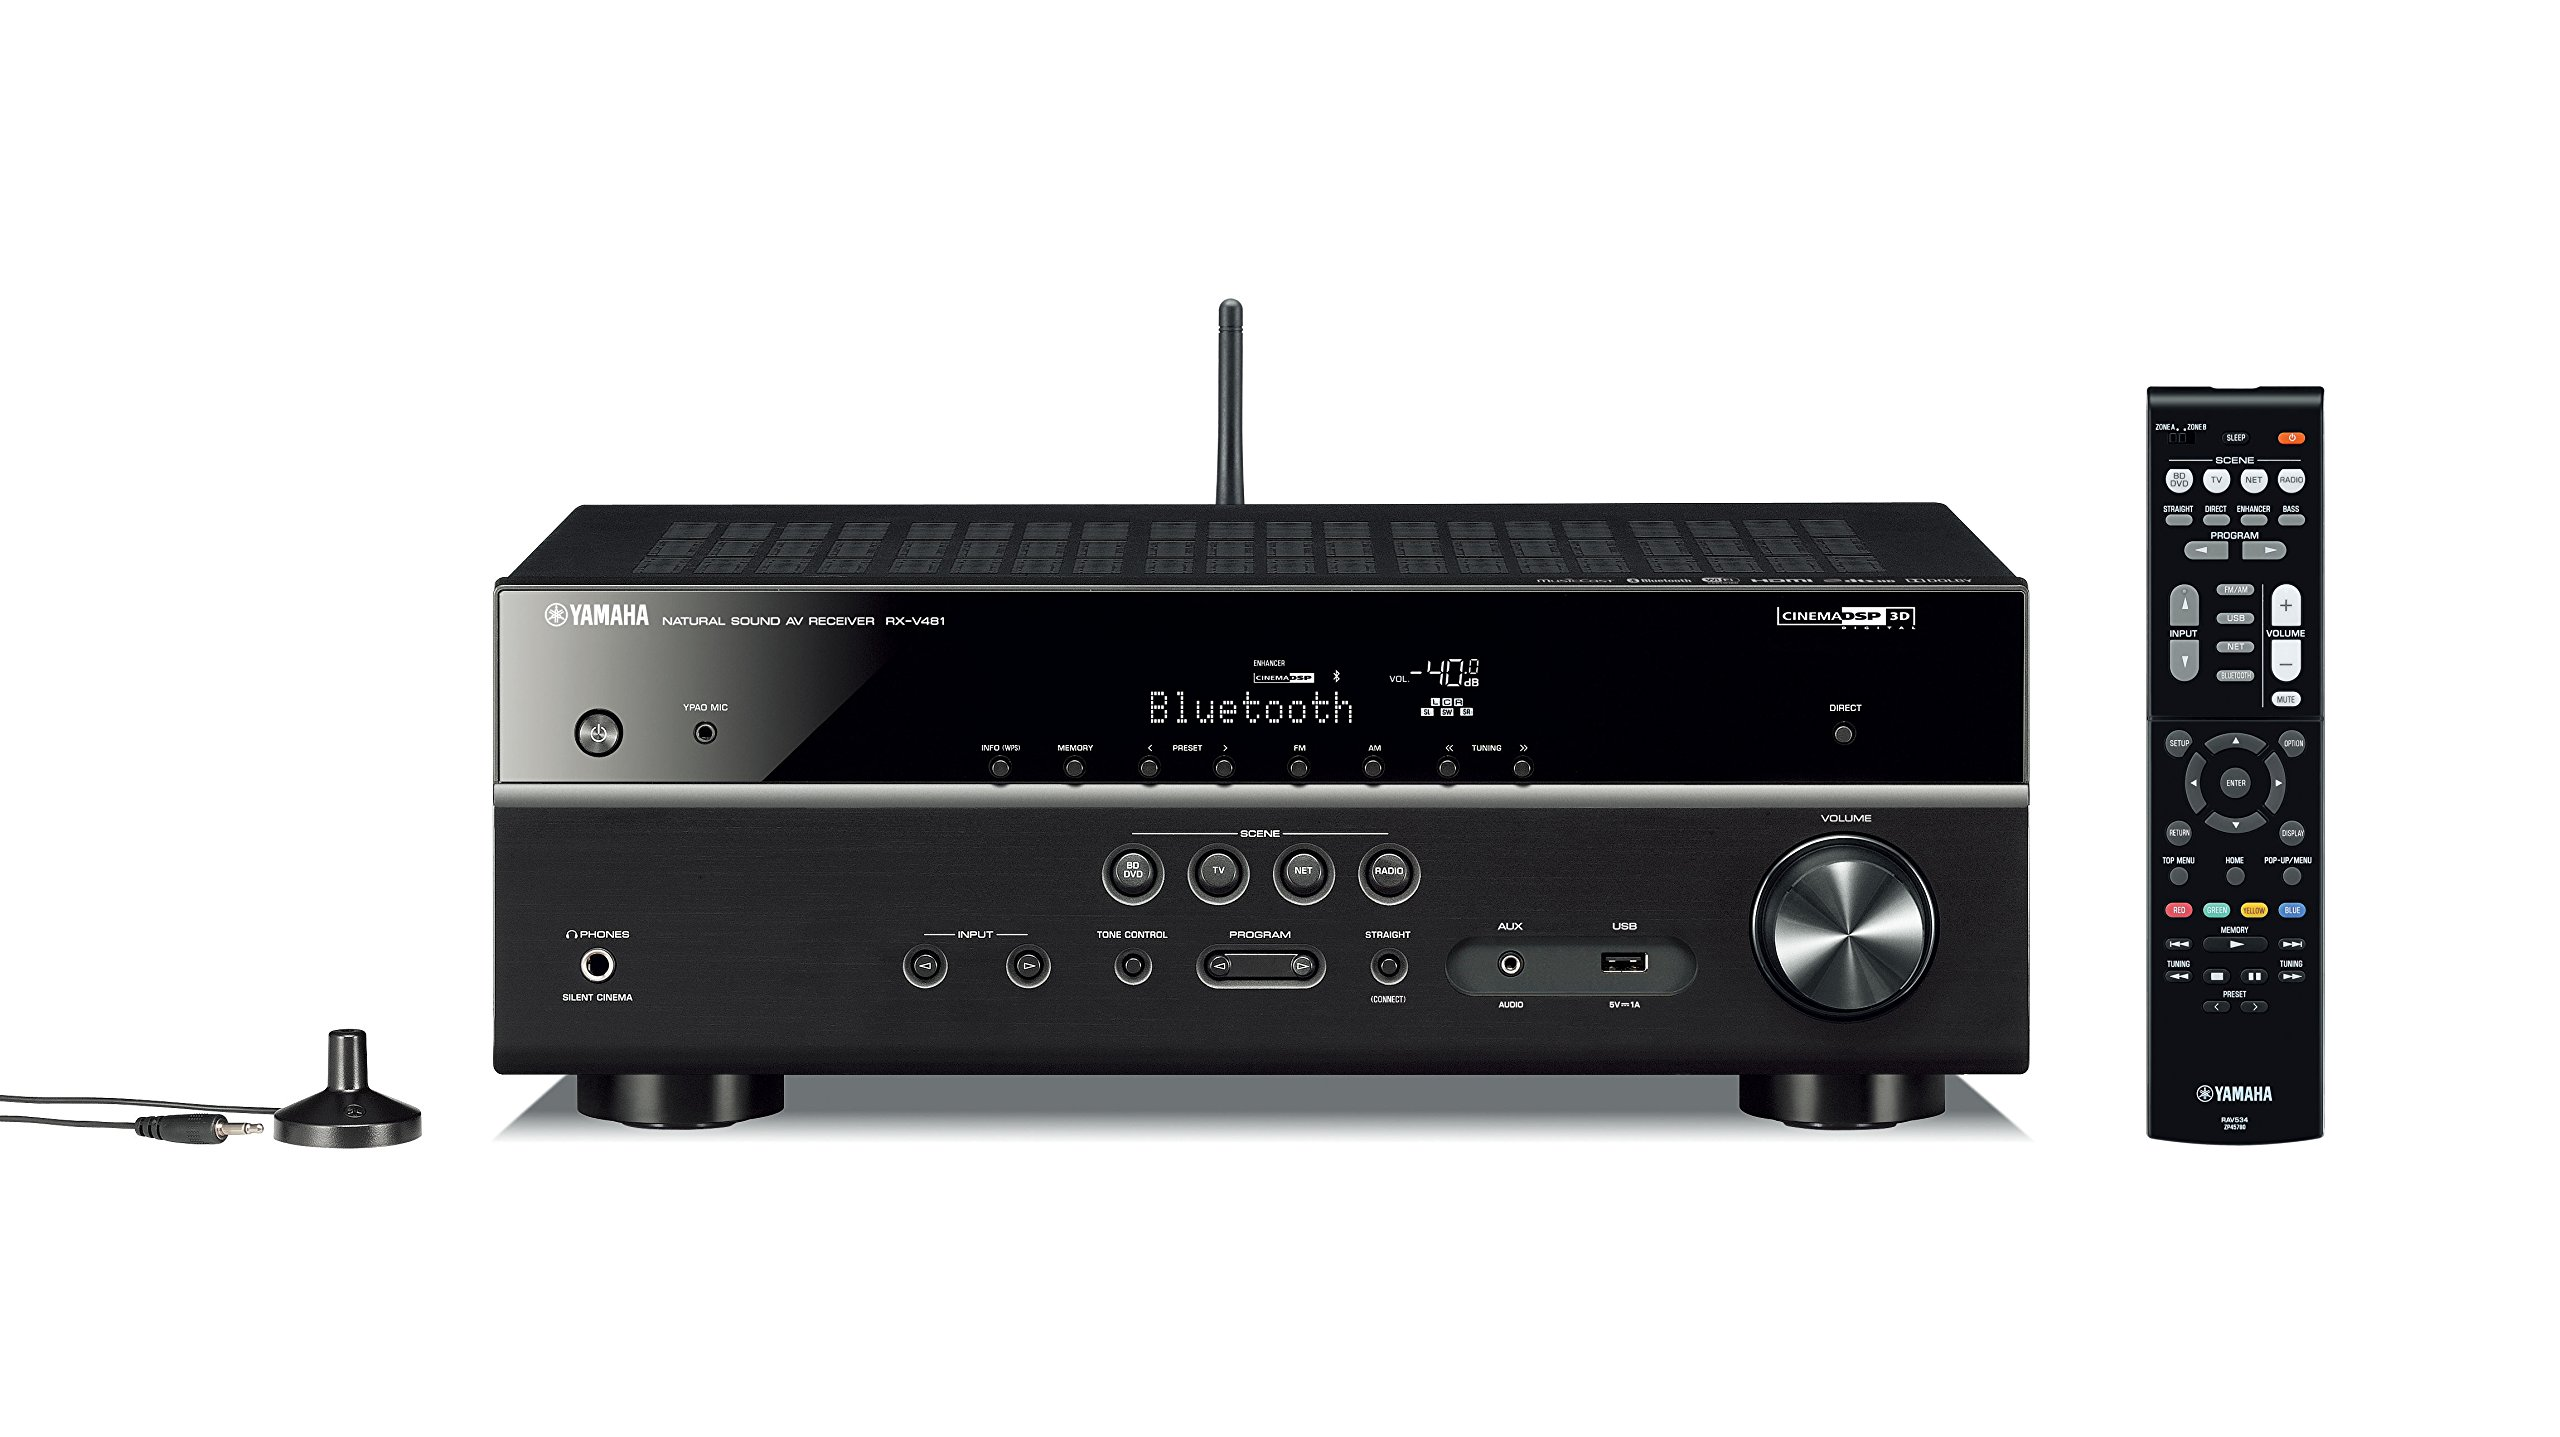 Yamaha RX-V481 - Receptor AV con AirPlay, radio por Internet, Wi-